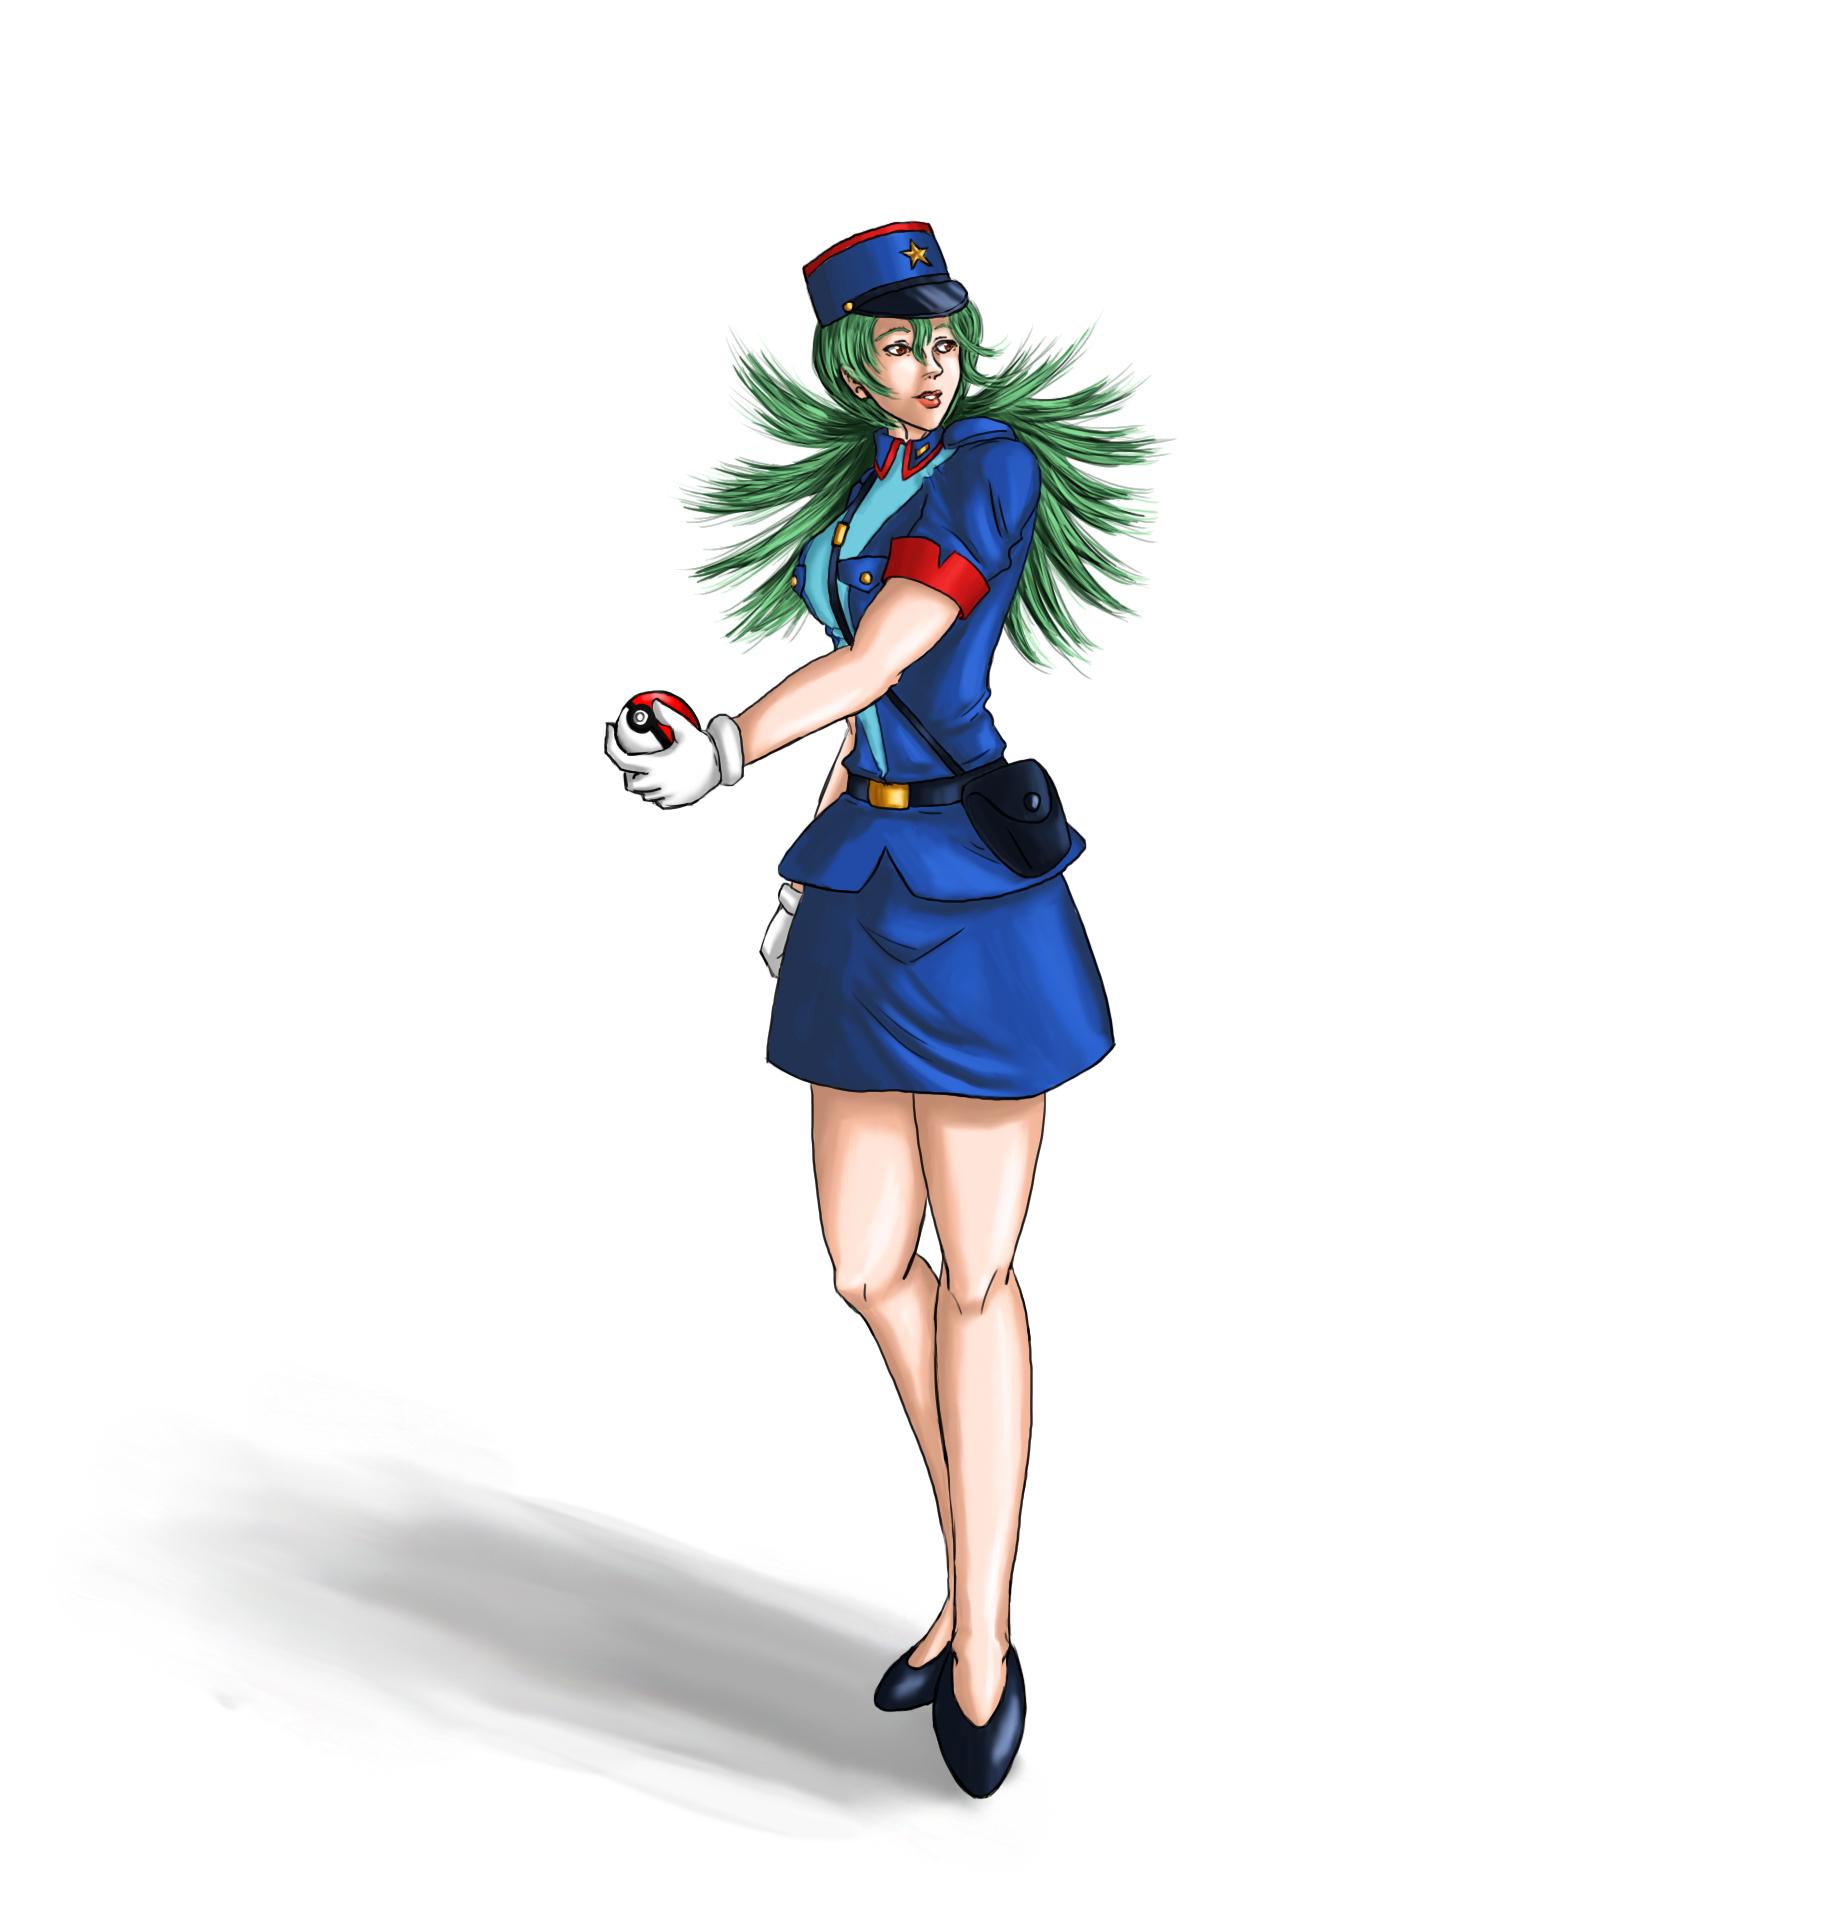 Officer Jenny Horse TF by EduartBoudewijn on DeviantArt